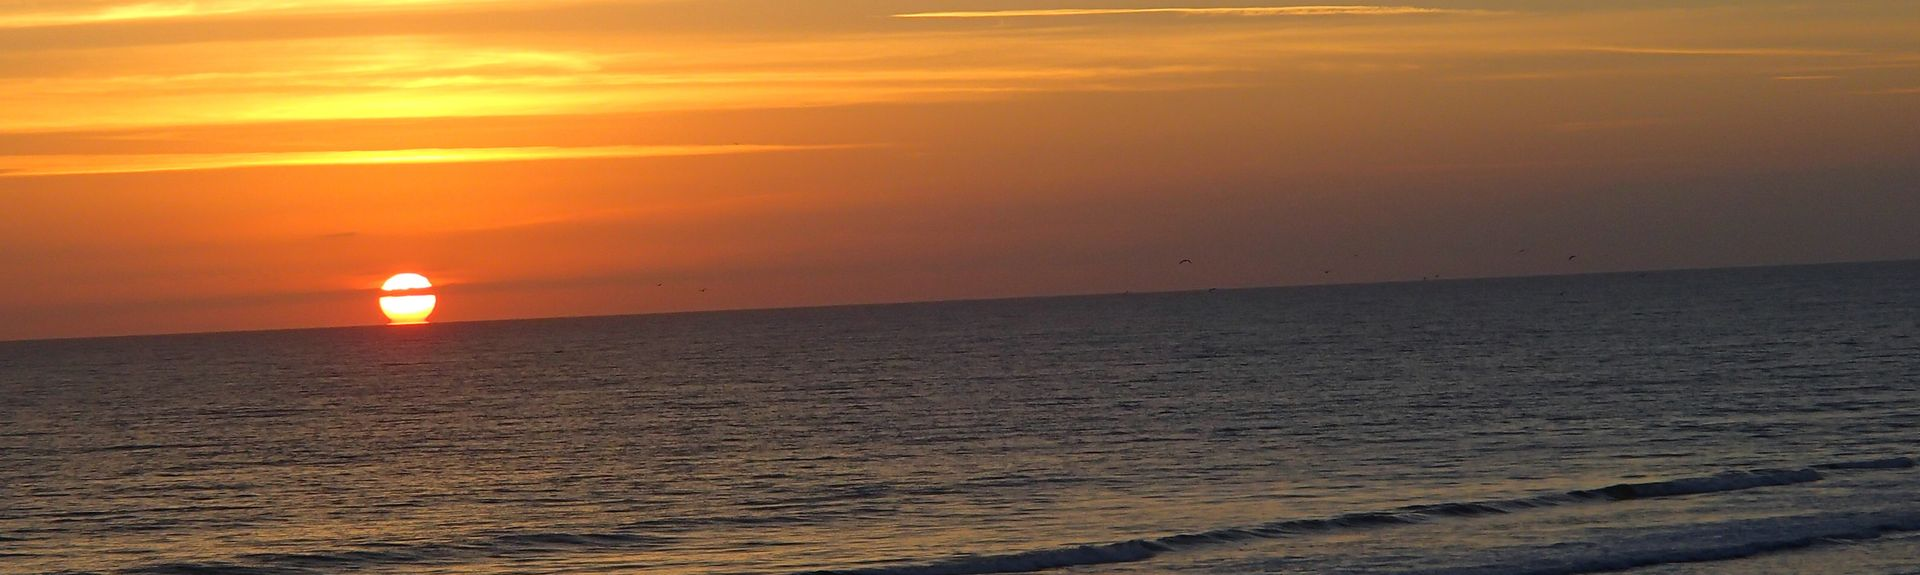 Bethune Beach, FL, USA